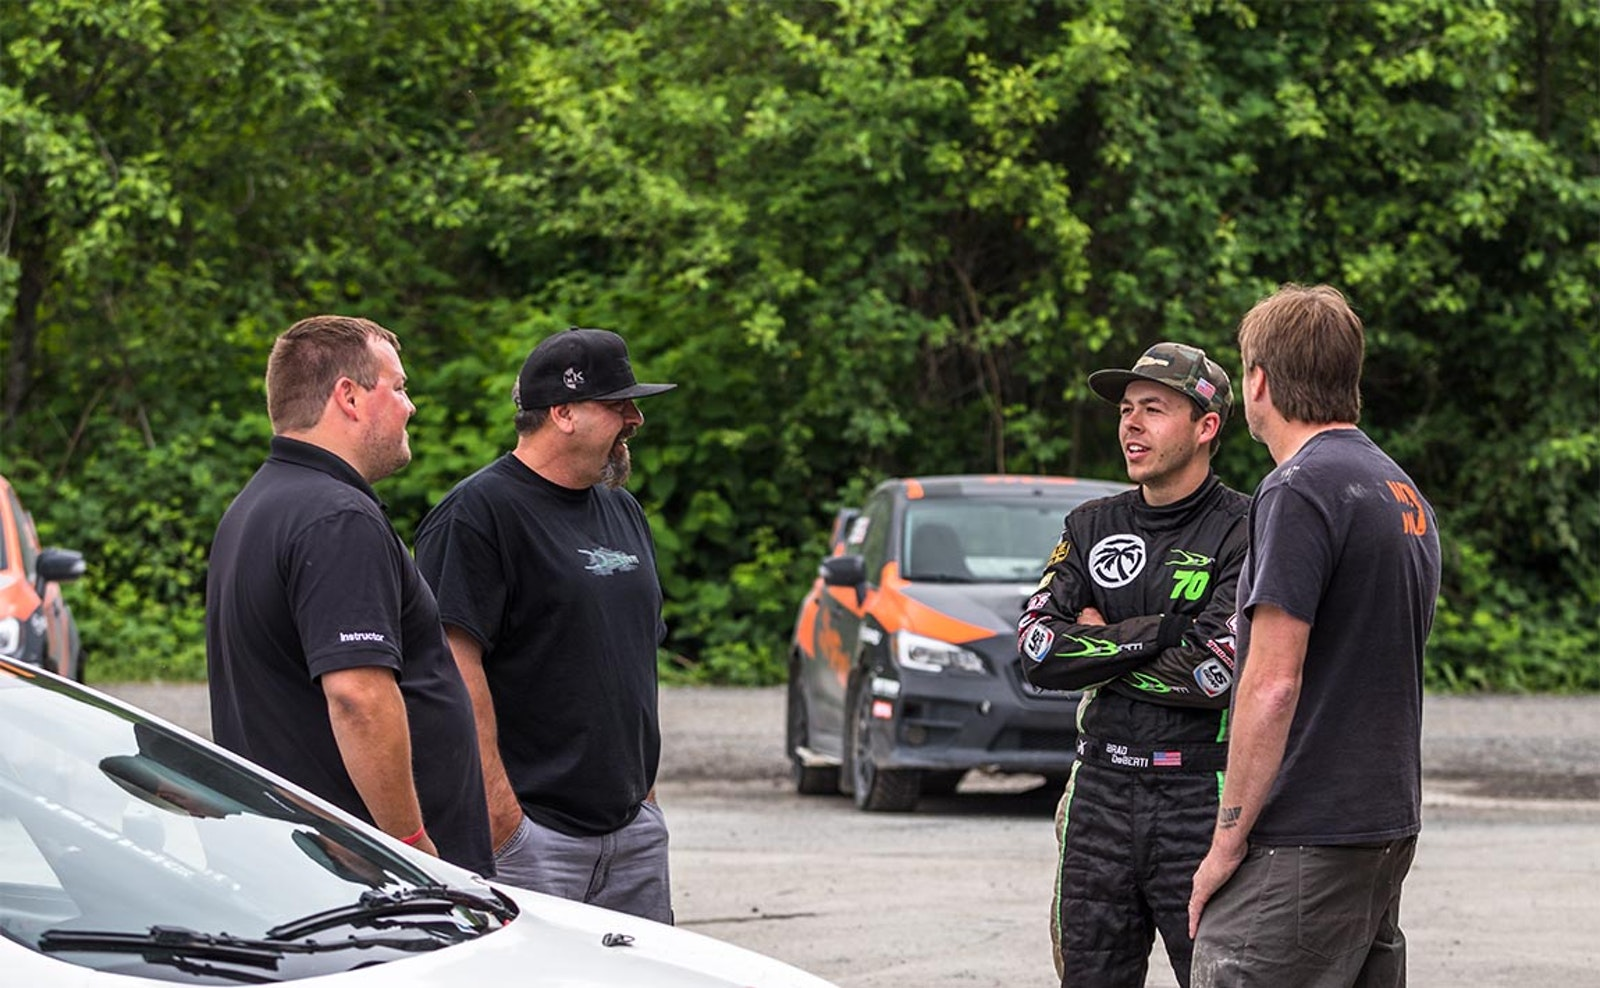 Brad DeBerti and Doug DeBerti talking with motorsports team at DirtFish